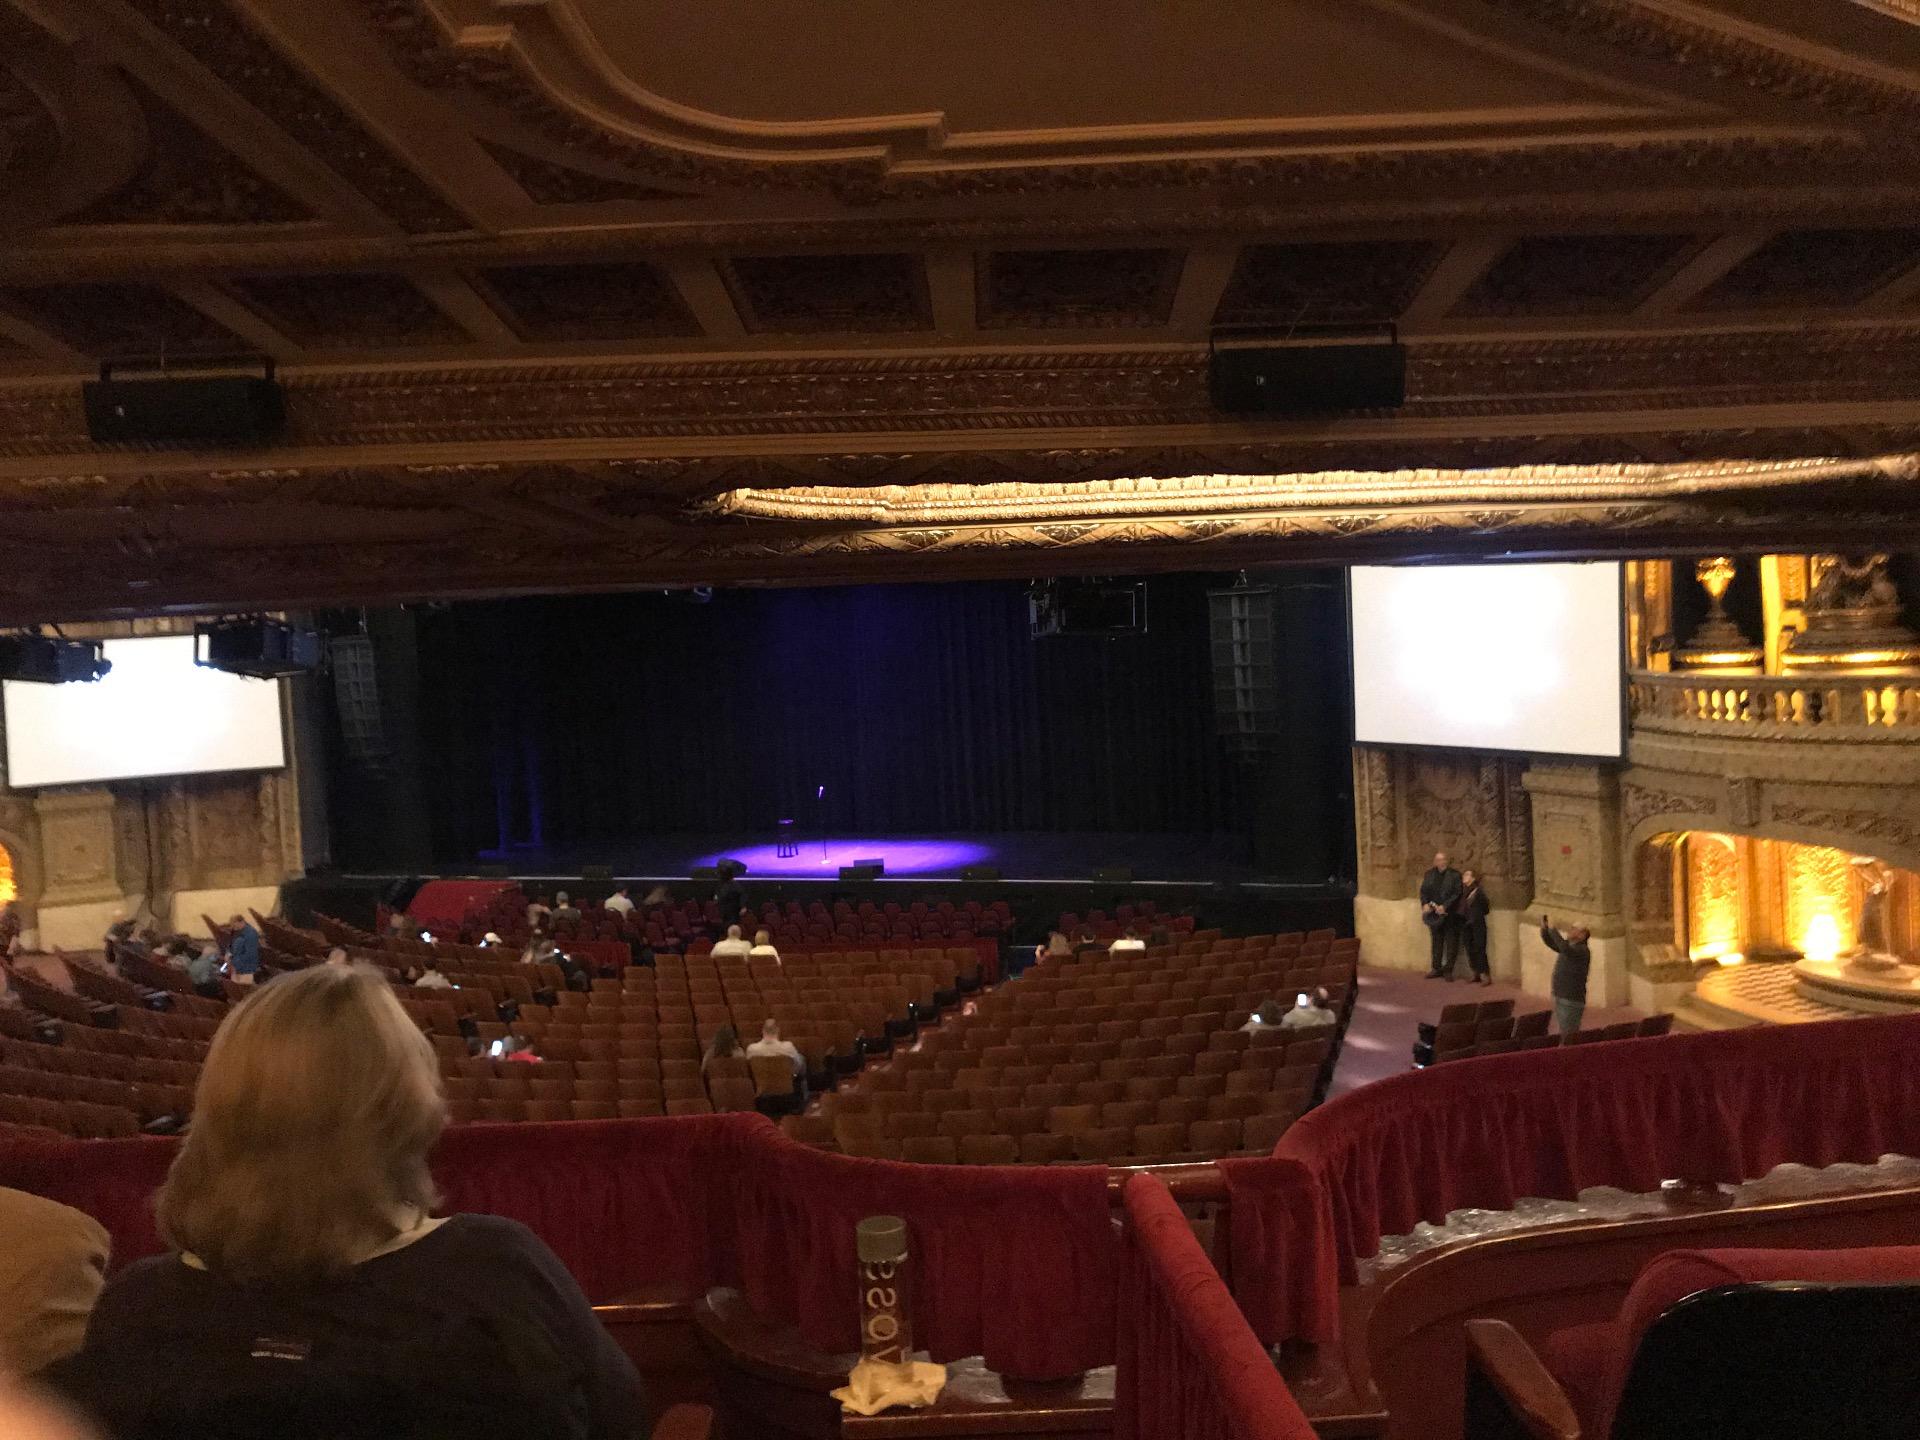 Chicago Theatre Section Mezzanine Box H Row H Seat 1-4